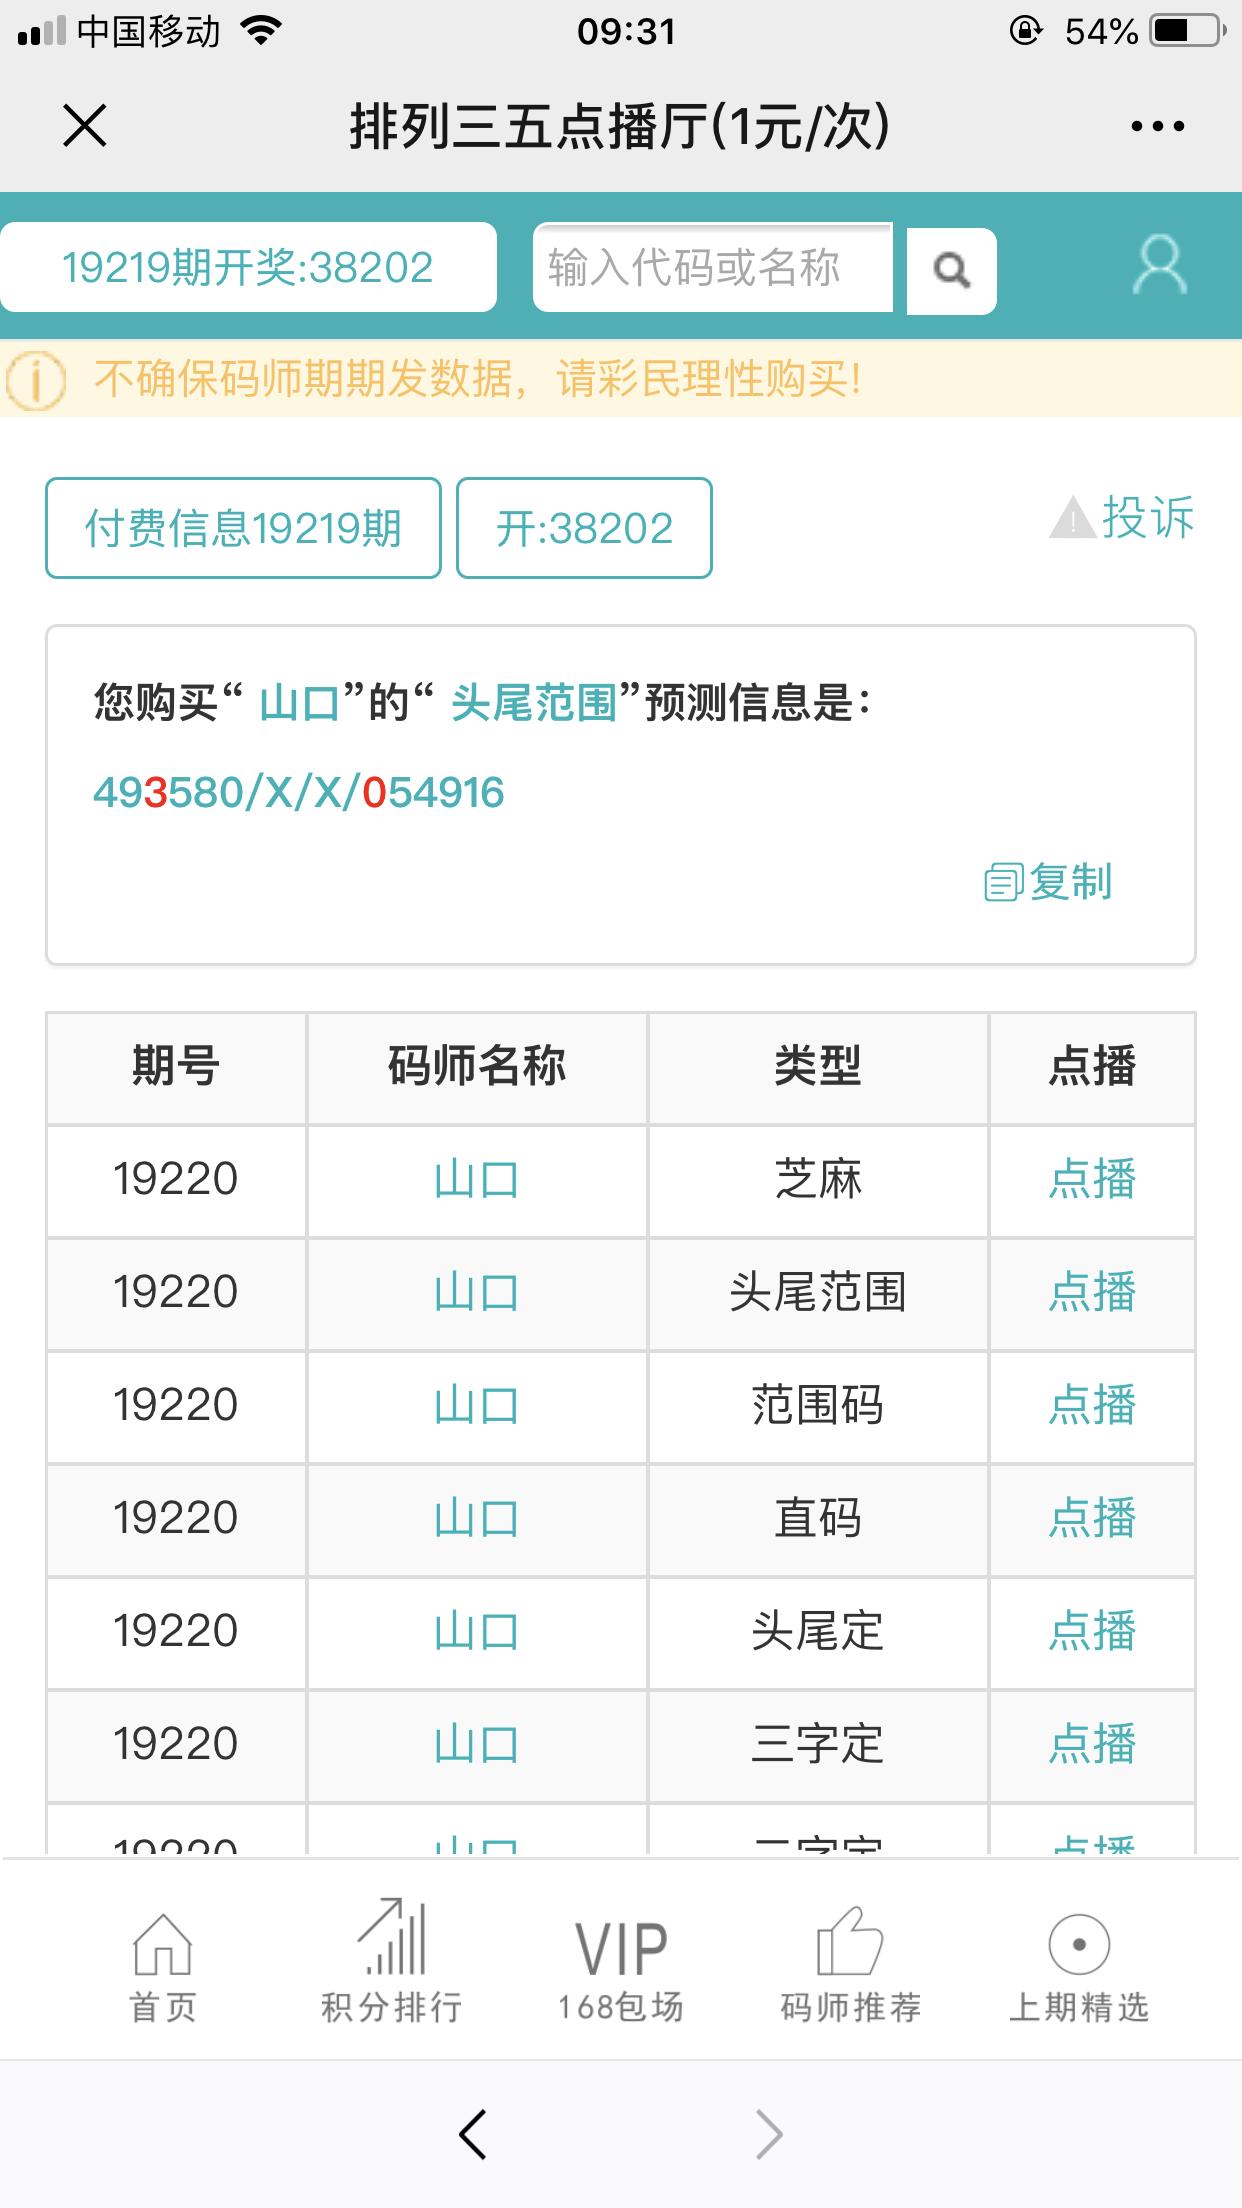 AD928FC1-FE7D-4A90-AC2B-C876F672200C.png